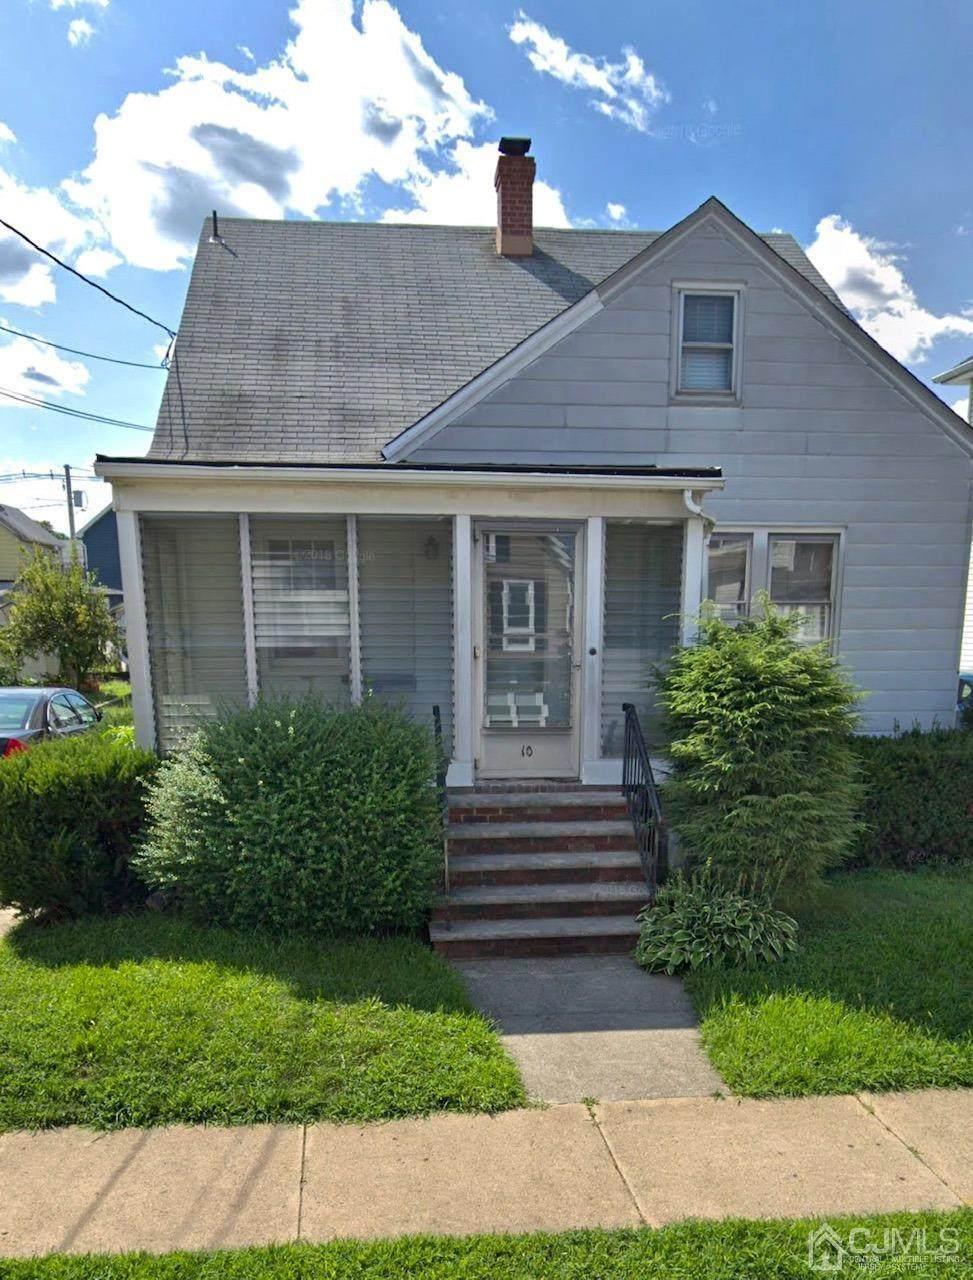 10 Stanton Street - Photo 1